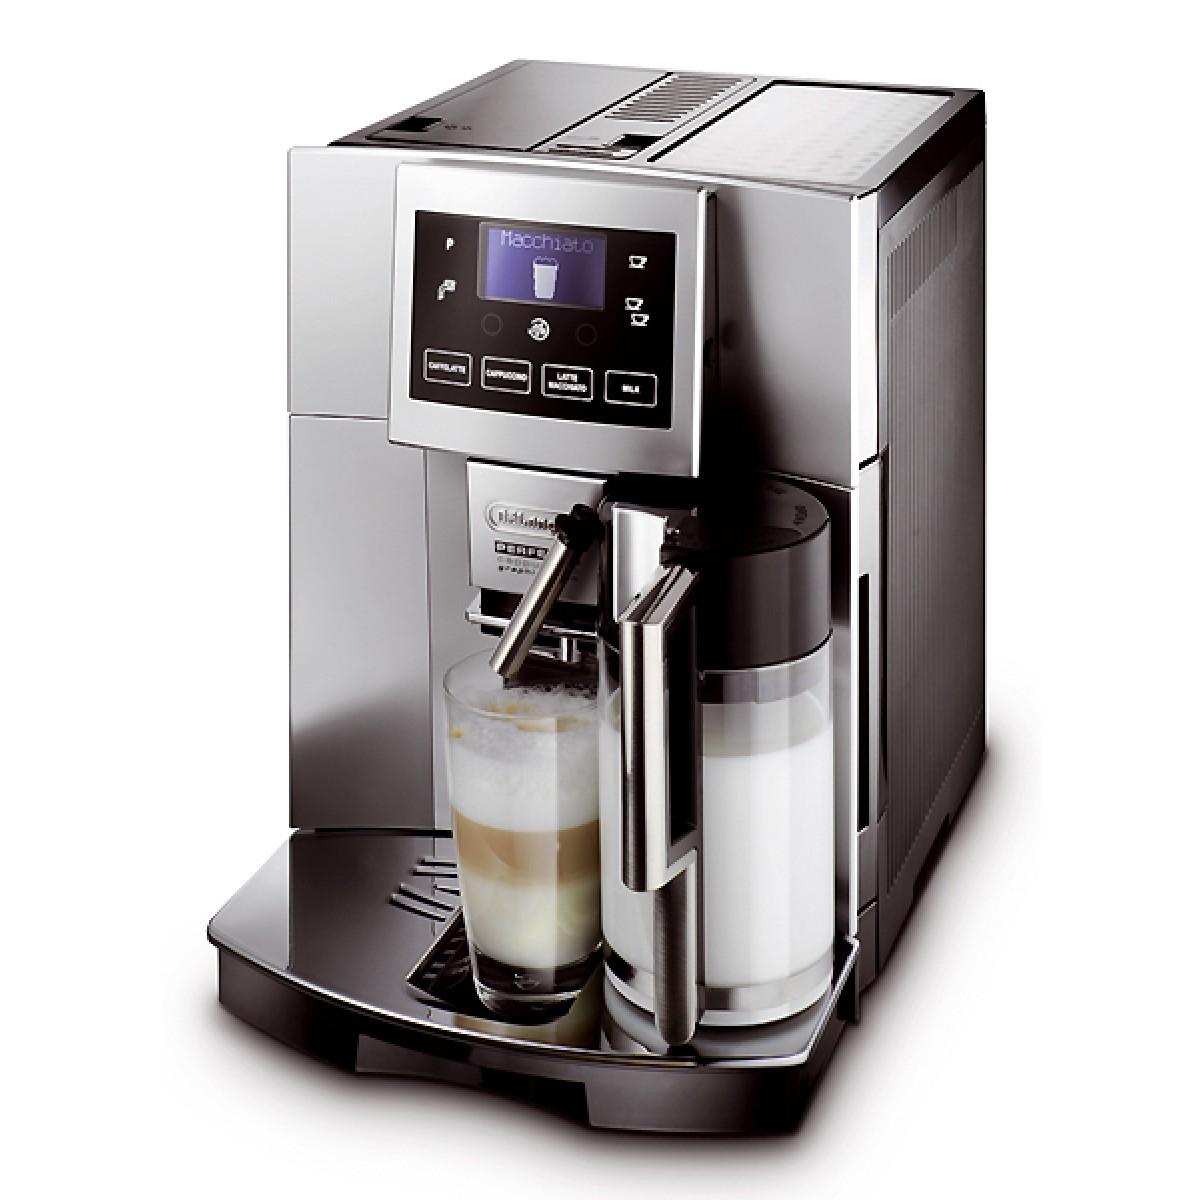 8004399323841 | Автоматическая кофемашина DeLonghi Perfecta ESAM 5600 | Coffee Shop